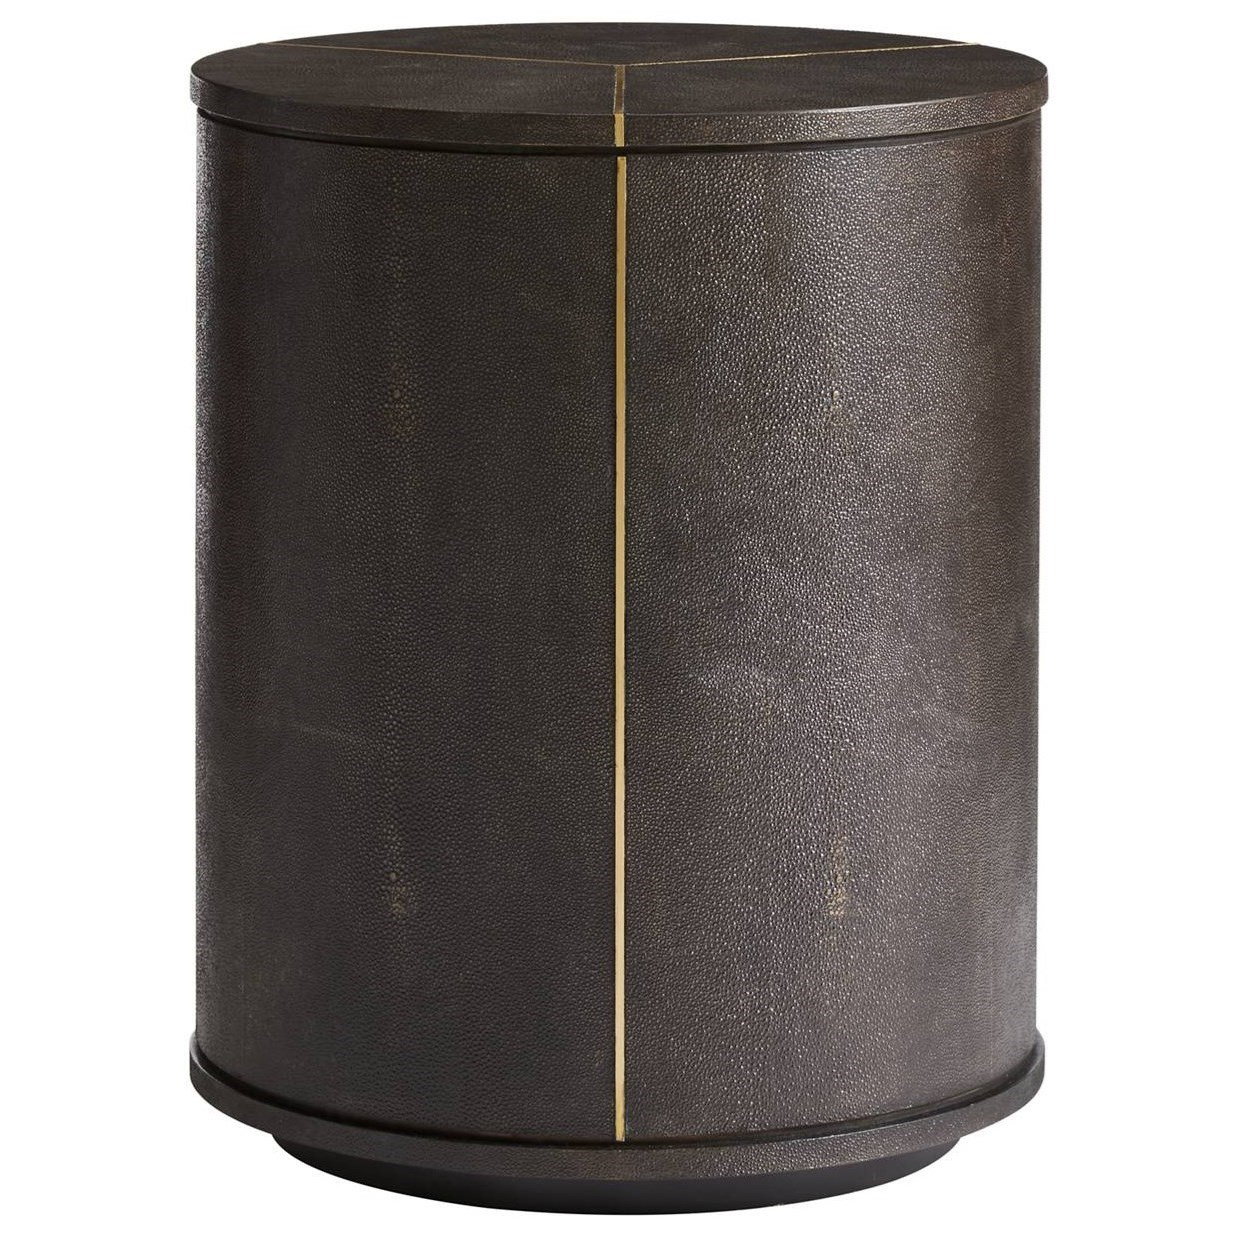 Stanley Furniture Panavista 704 75 14 Sundial Drum Table